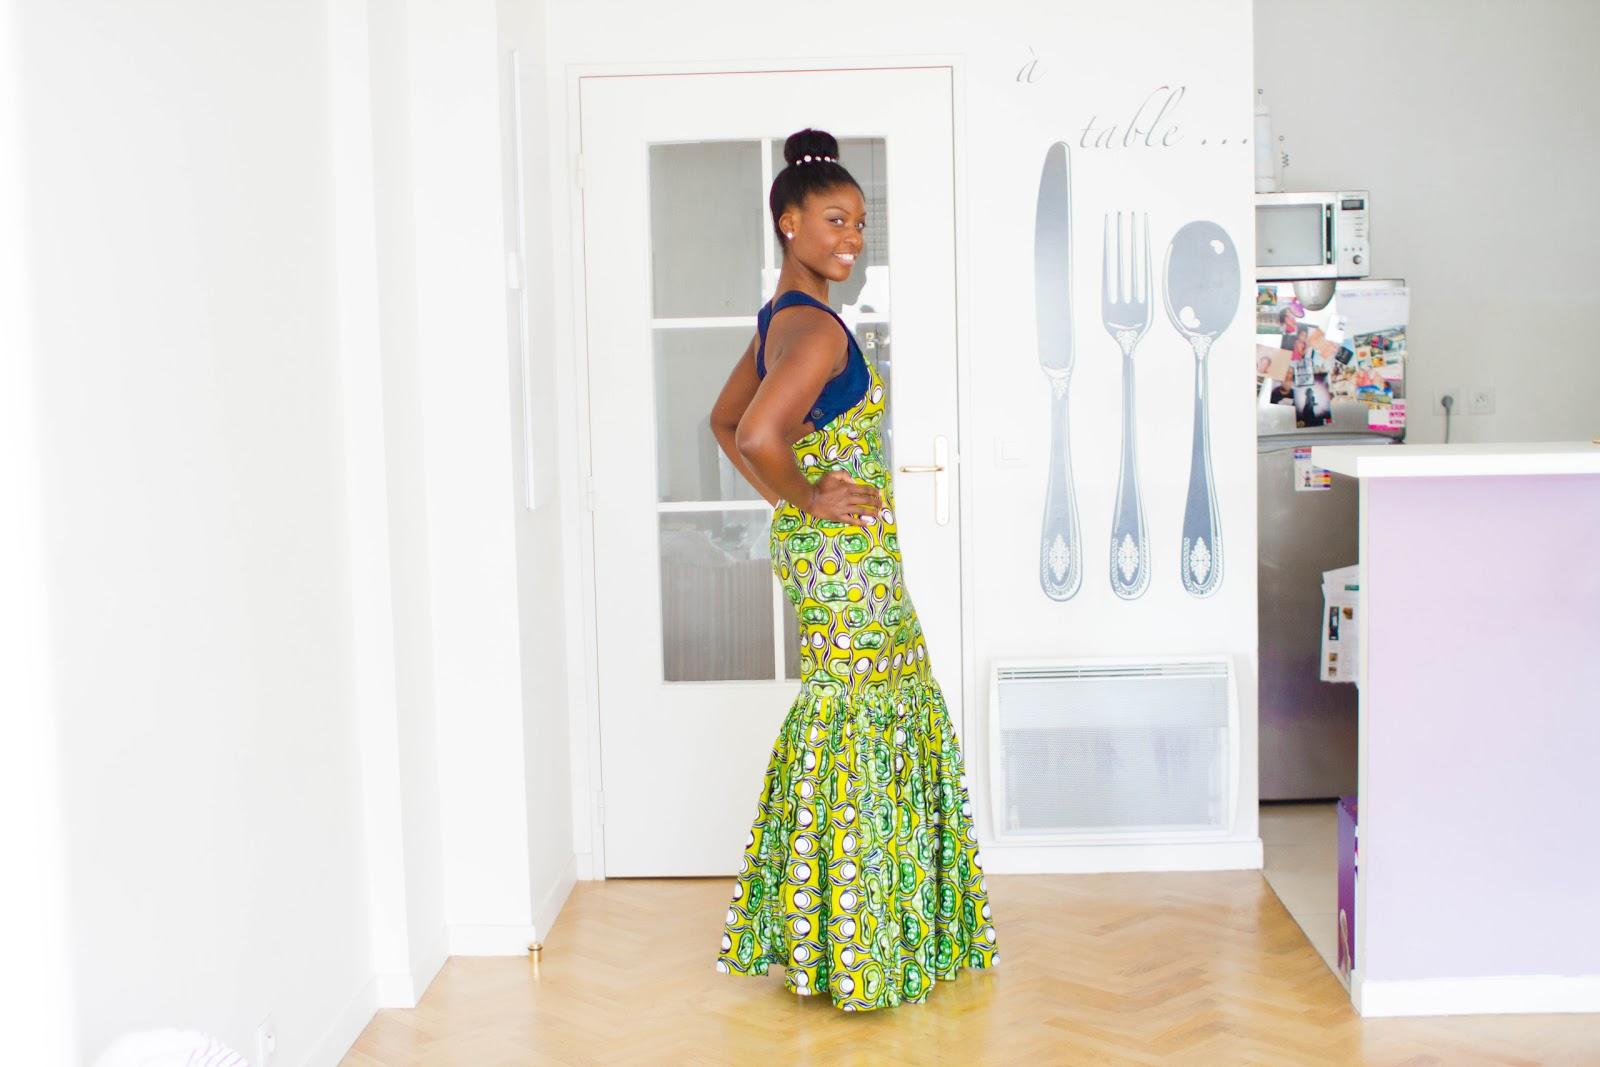 red cookie mariage et robe africaine. Black Bedroom Furniture Sets. Home Design Ideas